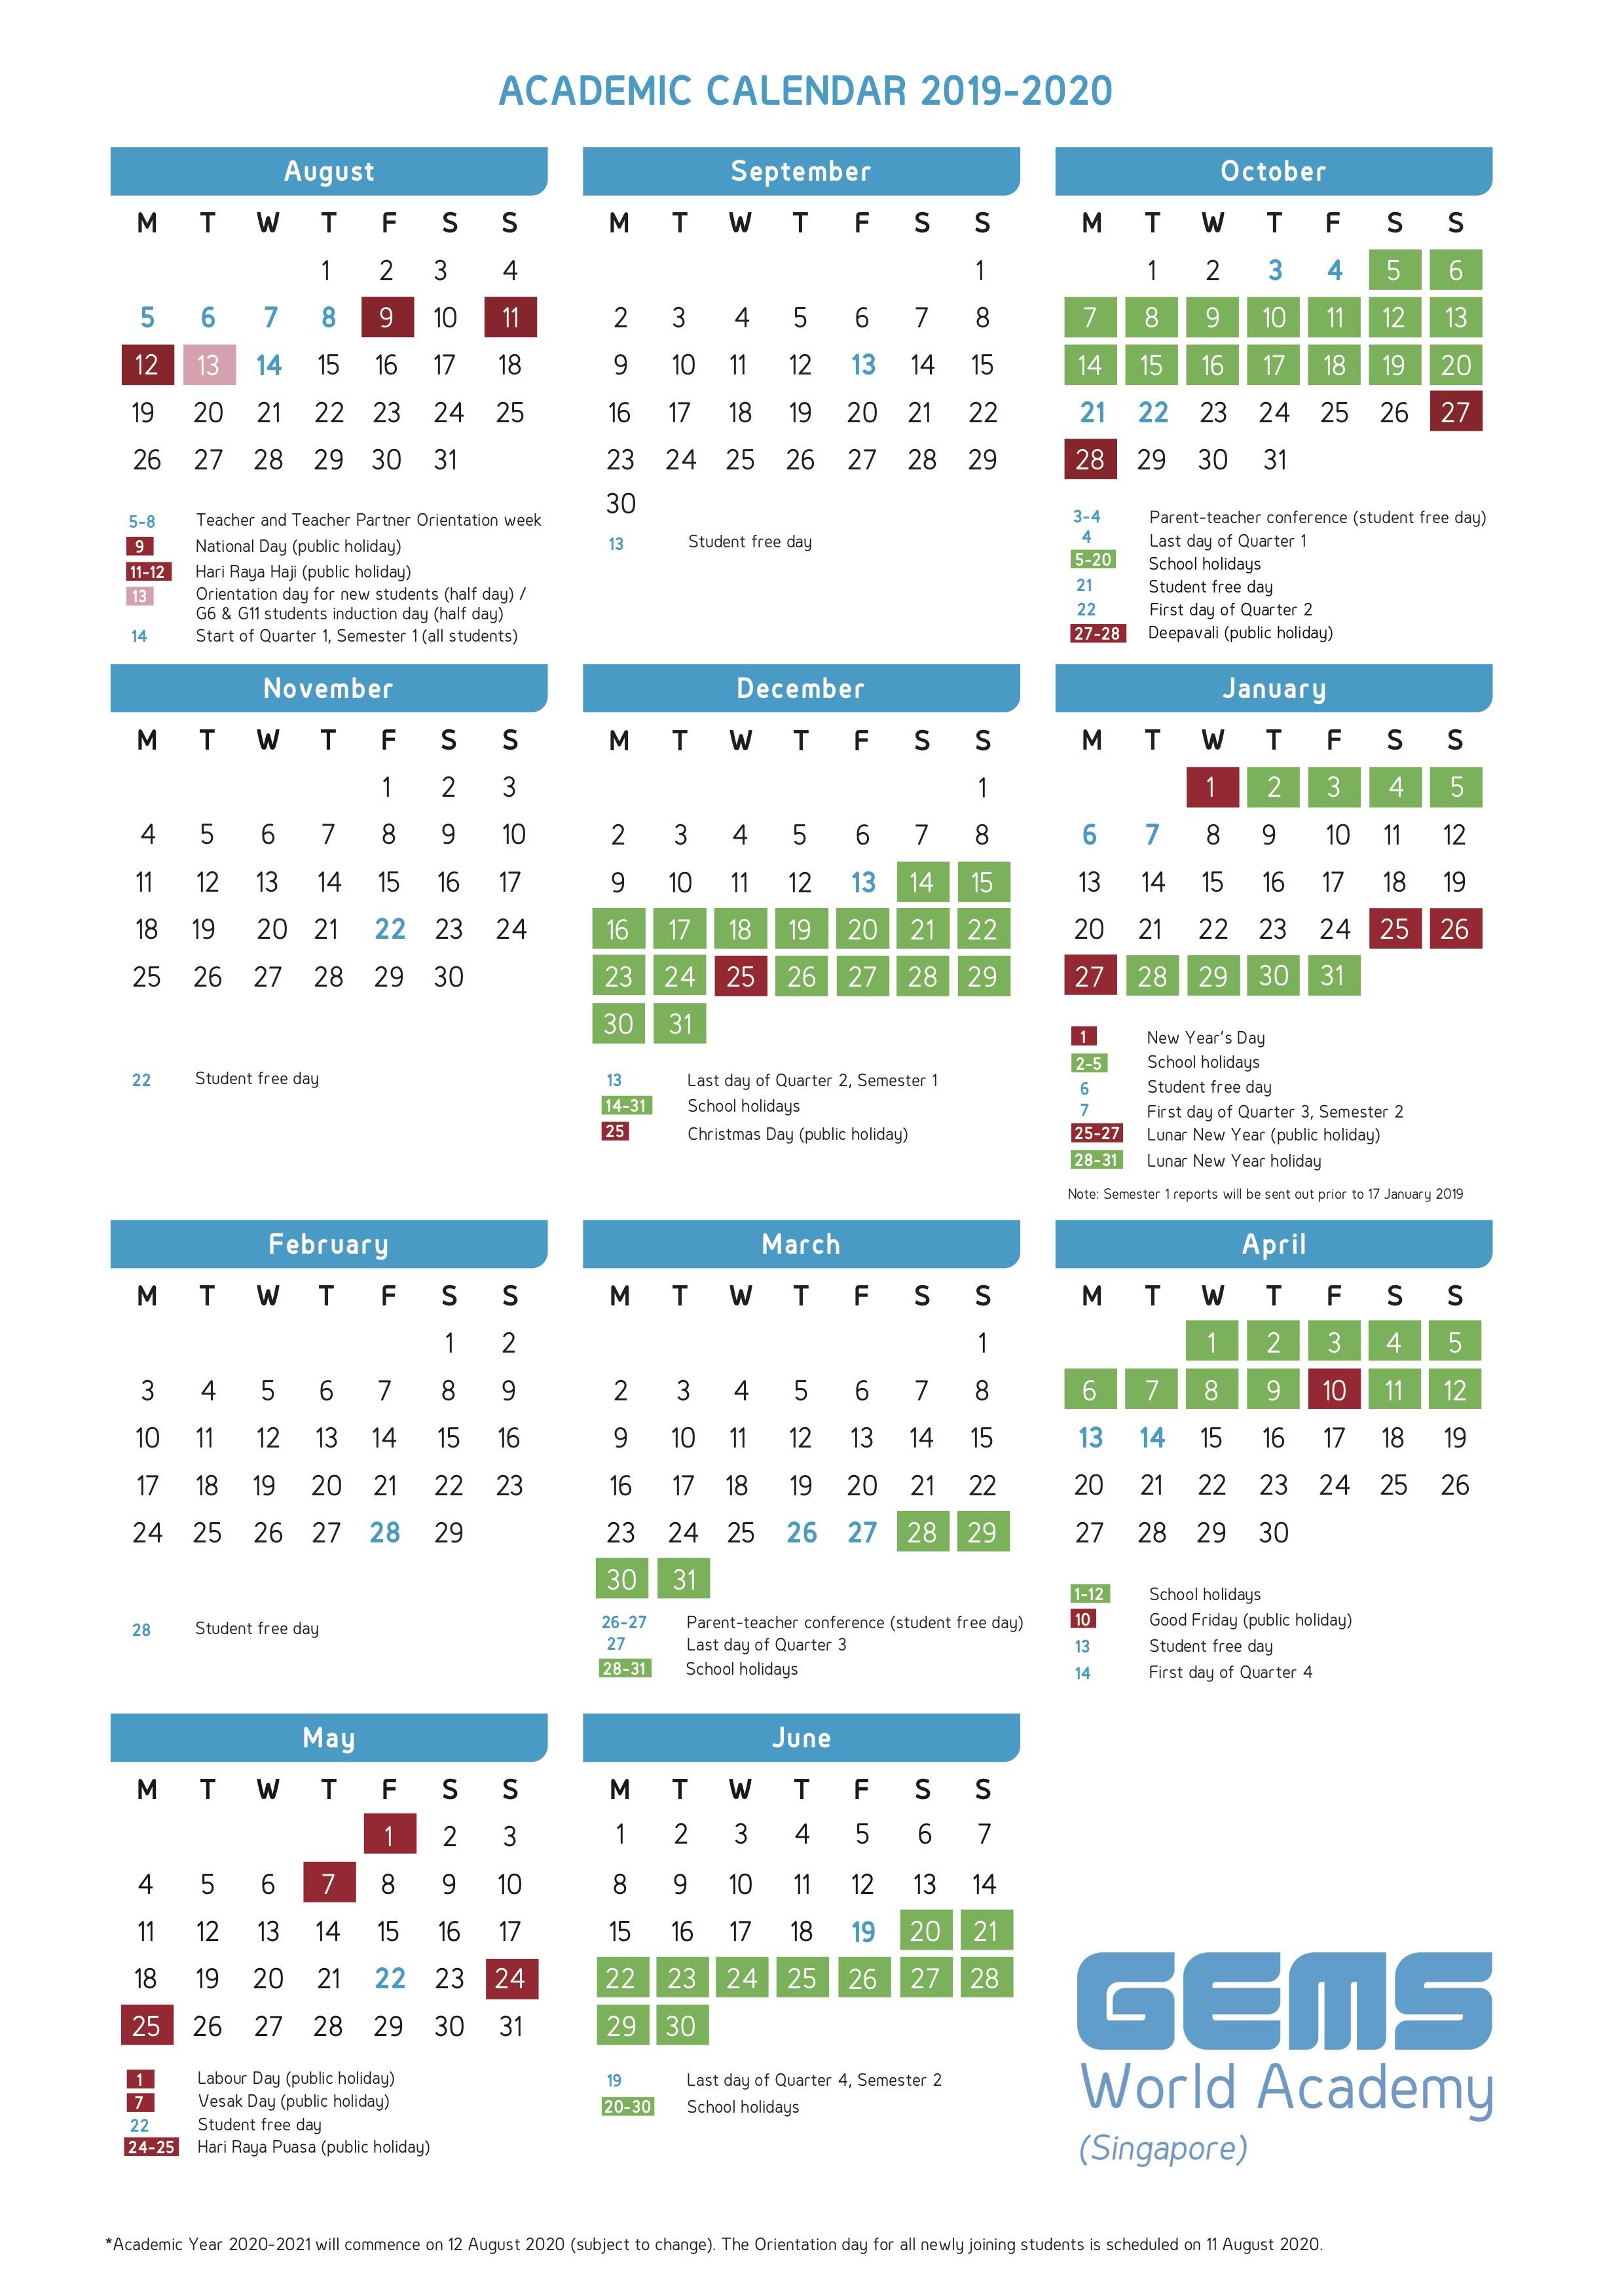 Academic Calendar | Gems World Academy (Singapore) intended for 2017 School Calendar South Africa